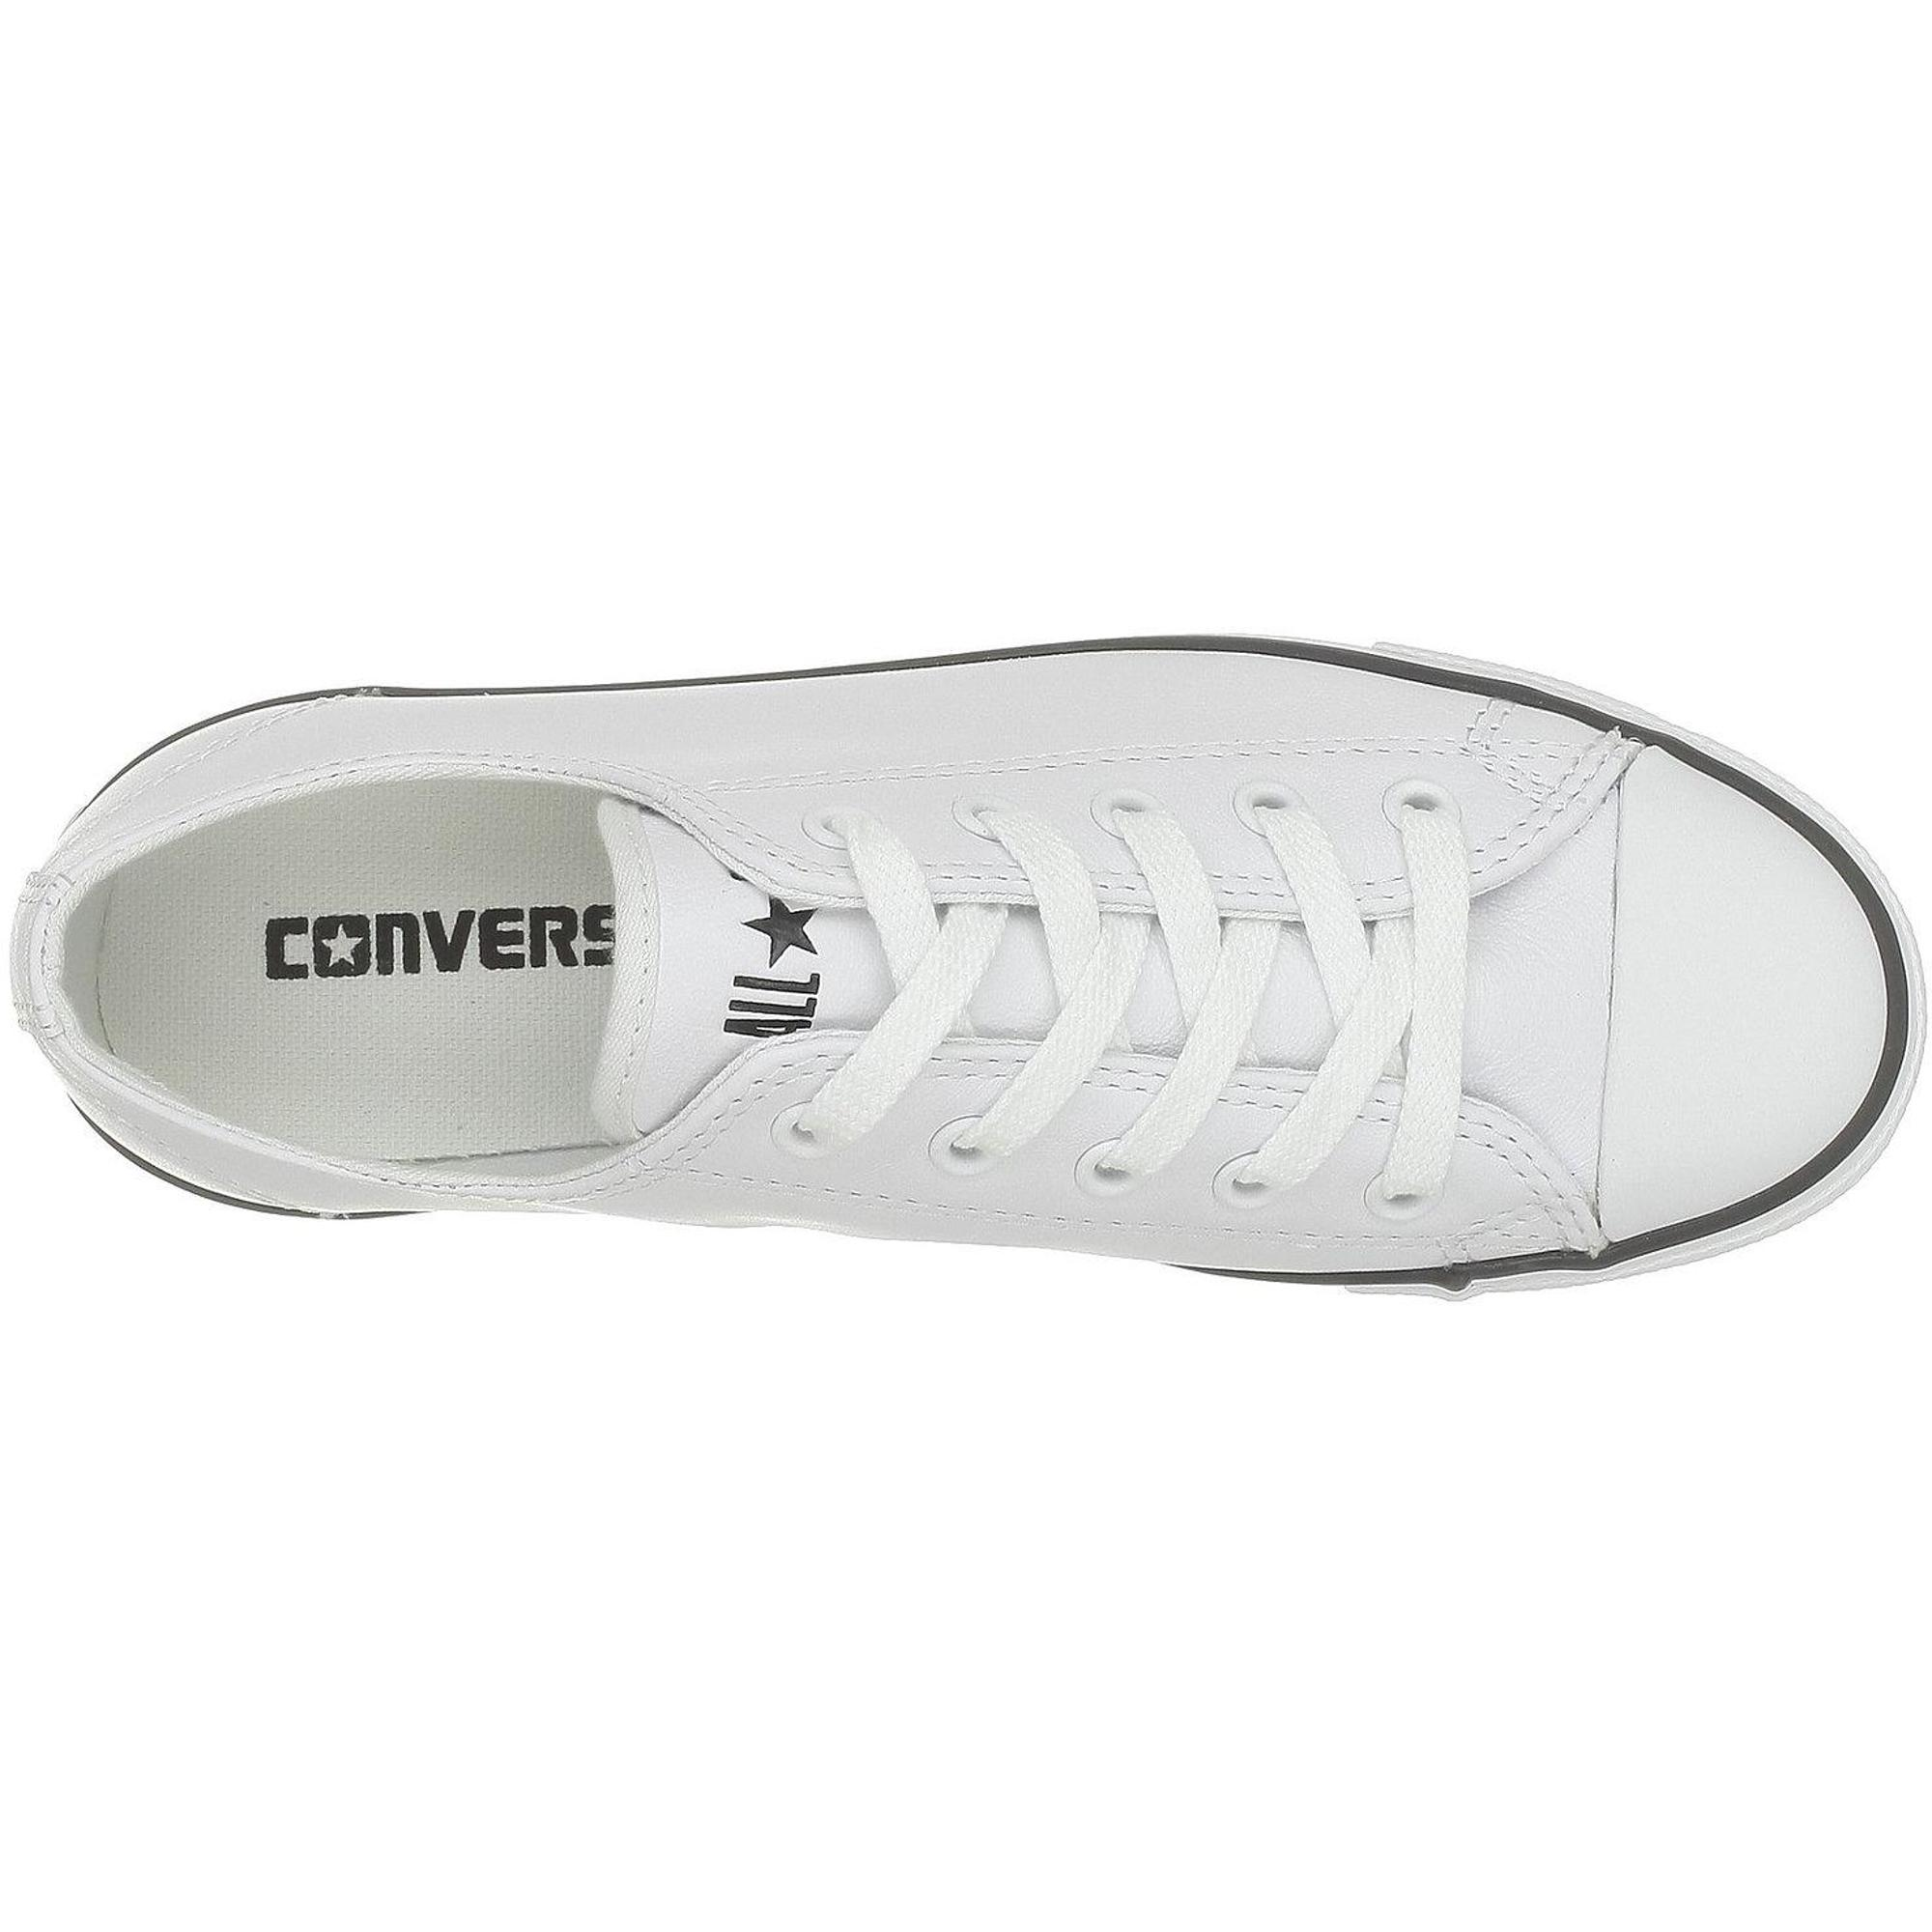 Converse Chuck Taylor All Star Dainty Weiß Leder Erwachsene